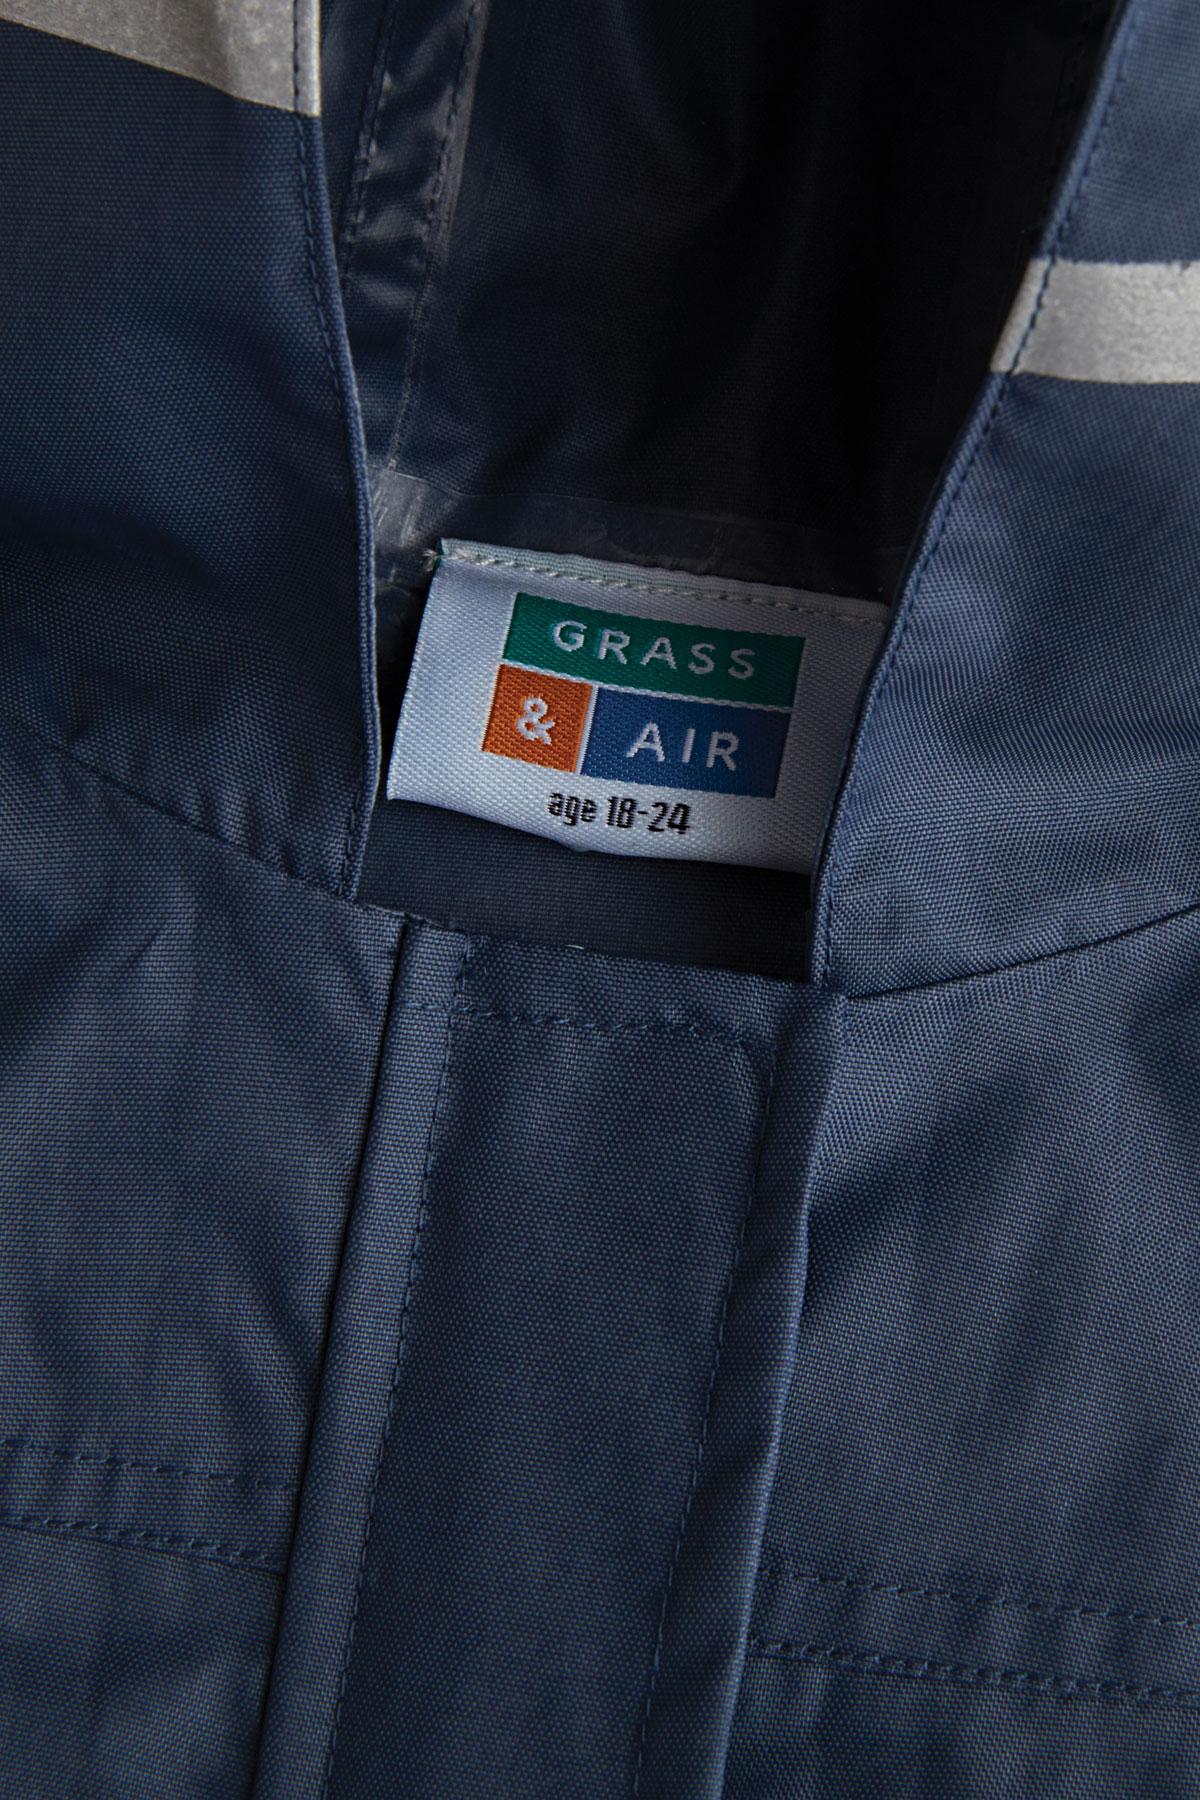 kids navy rain coat label and storm flap detail